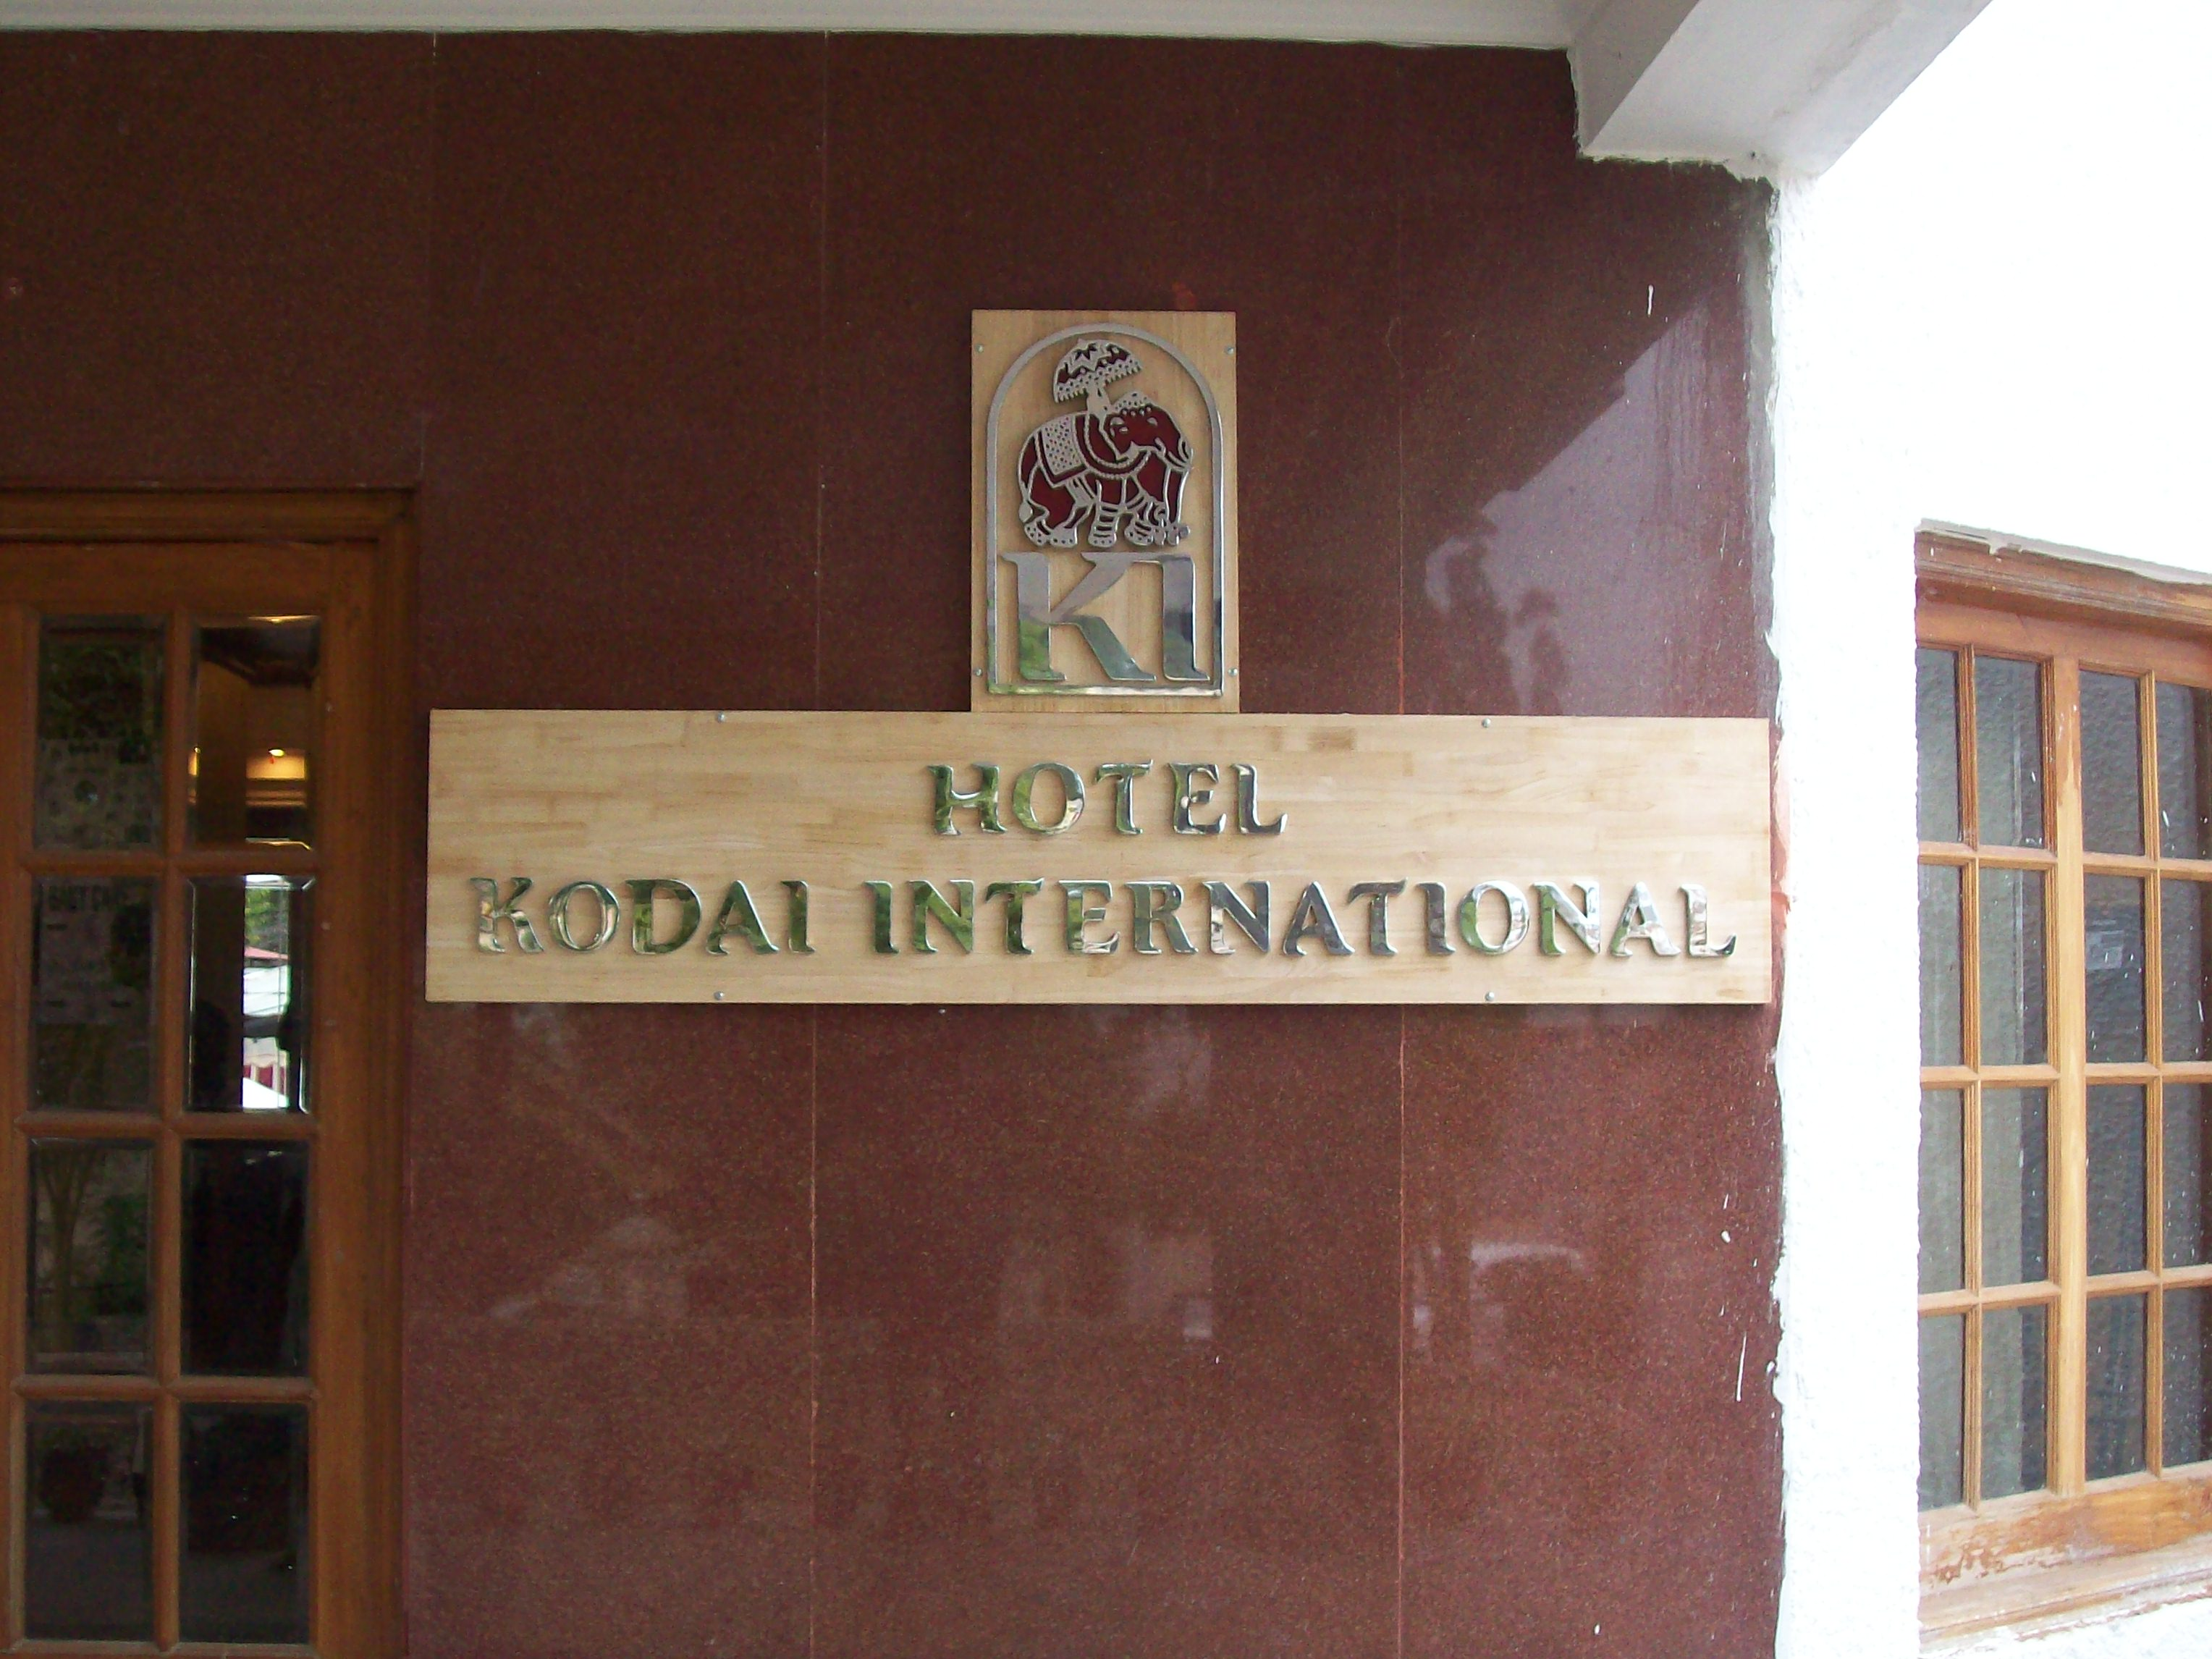 Hotels/Restaurants